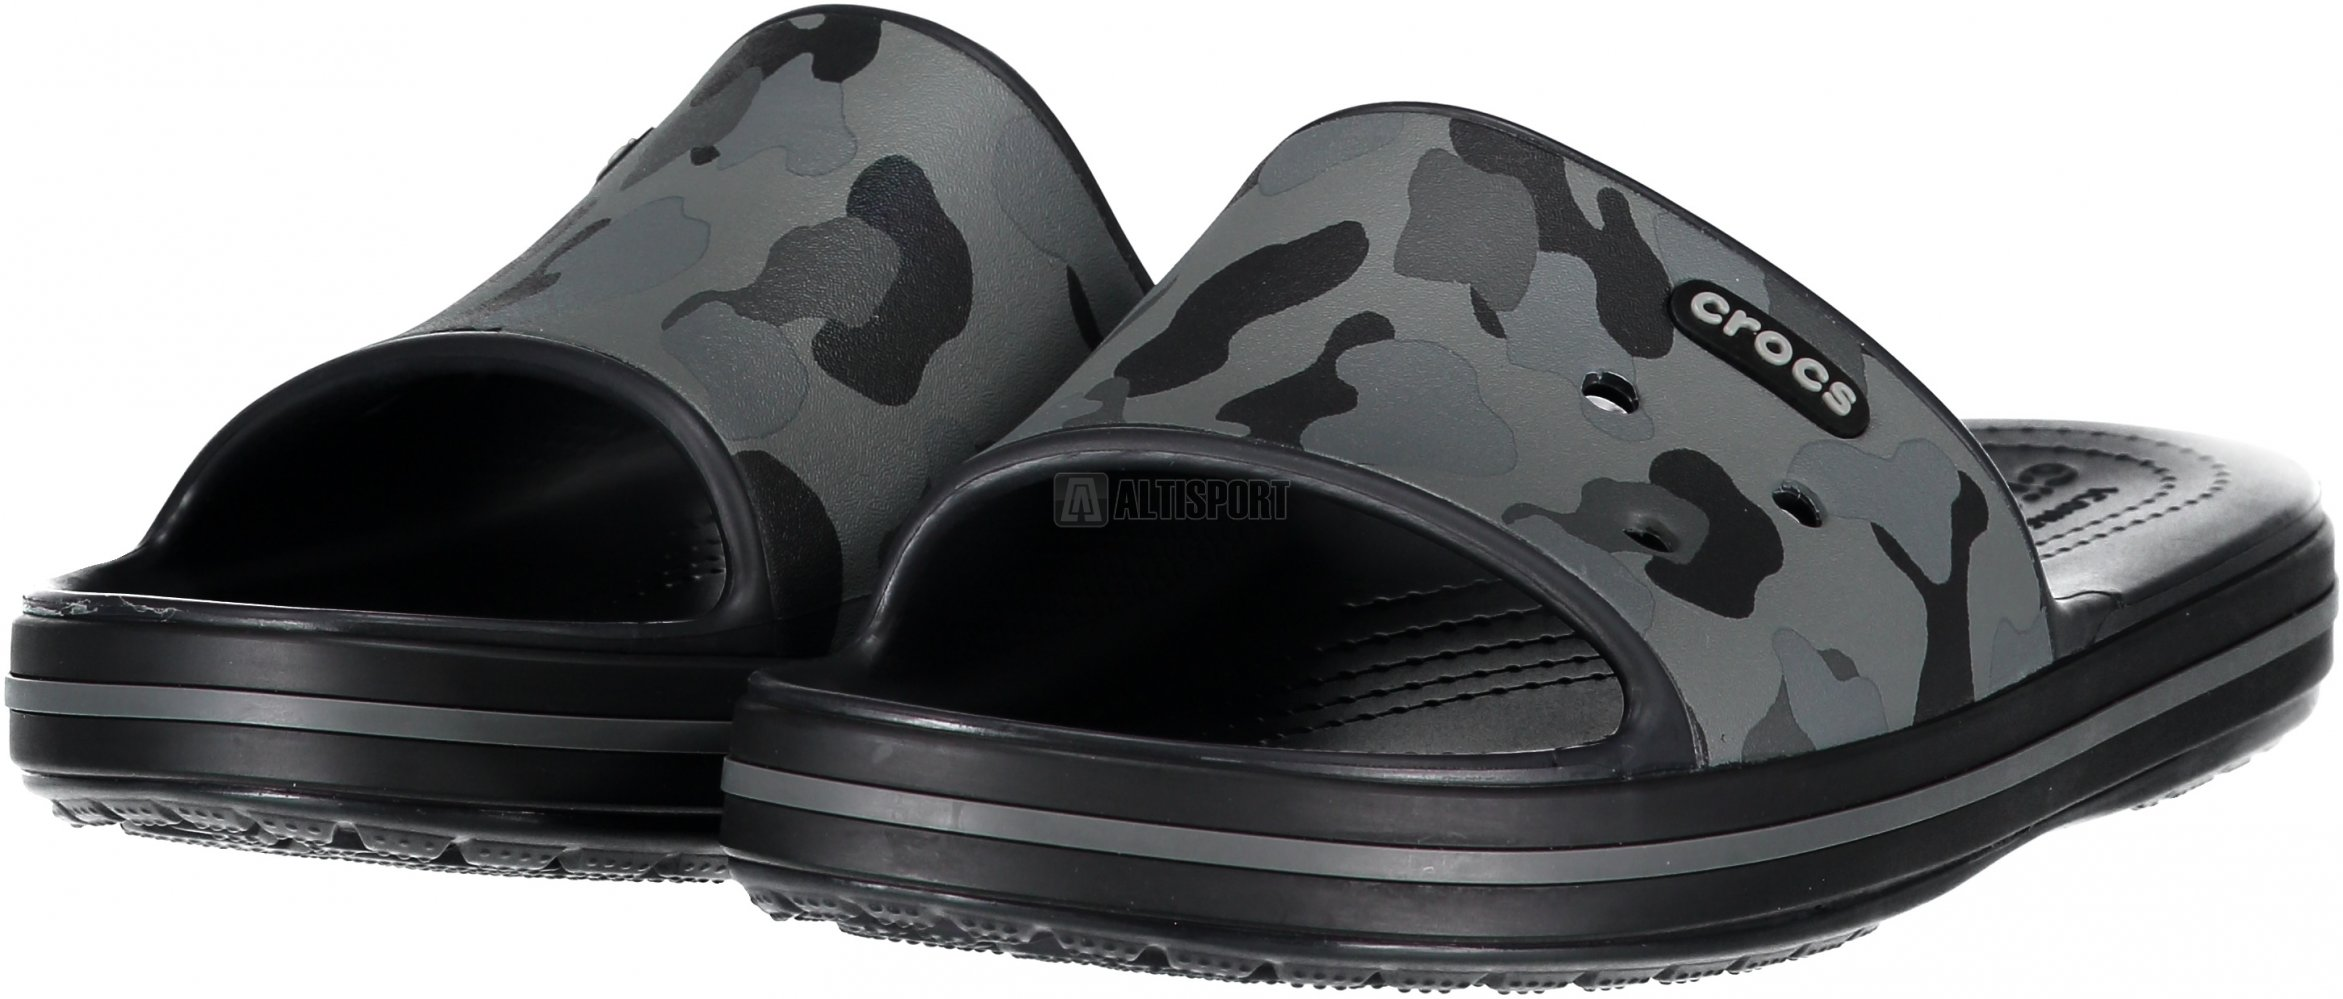 Dámské pantofle CROCS CROCBAND III 205583-0DY SLATE GREY BLACK ... 043878b7ce